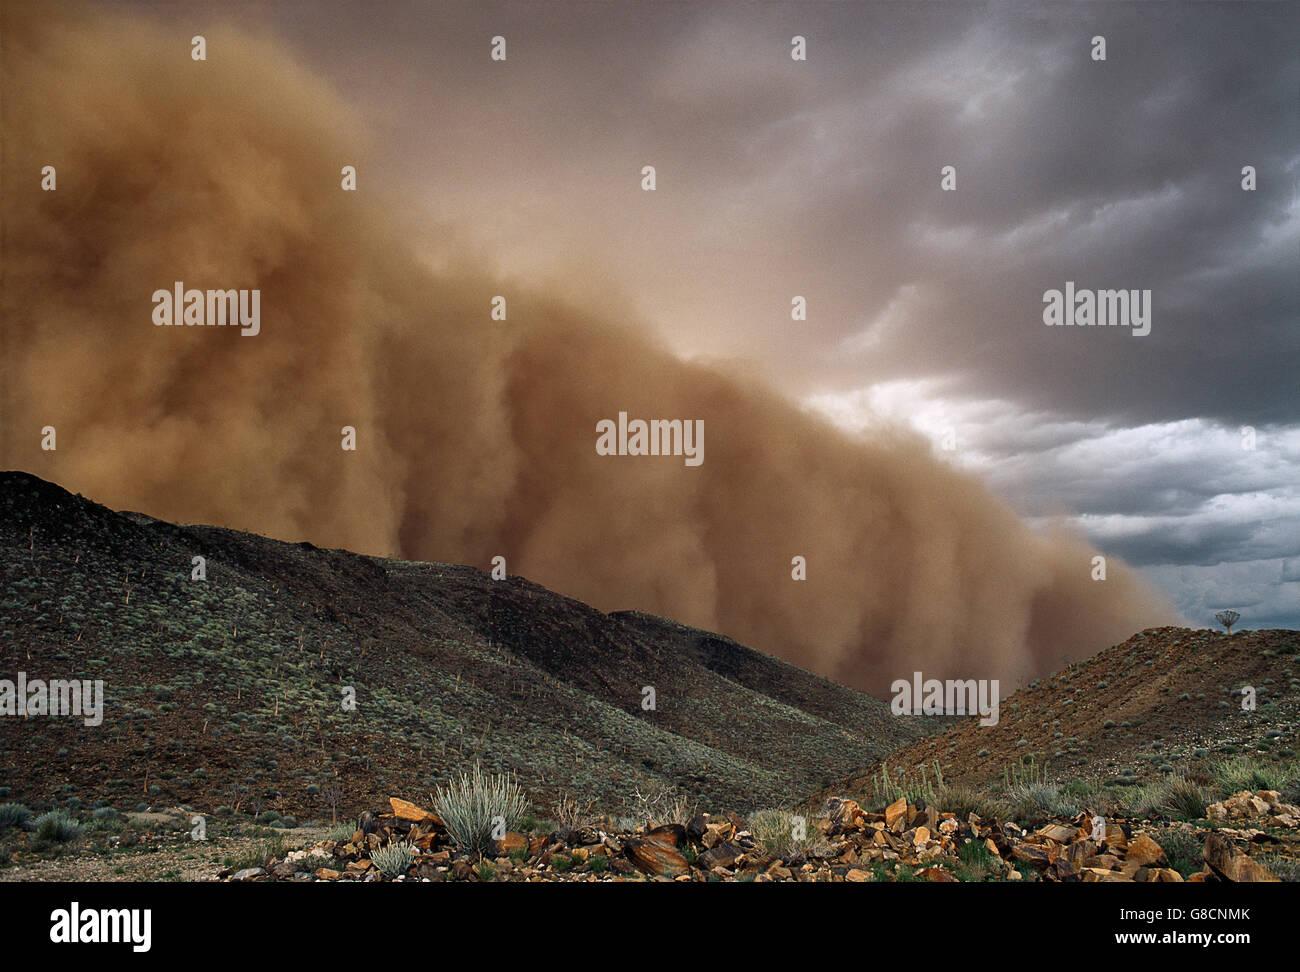 Tempesta di sabbia, Namib Desert, Namibia. Immagini Stock